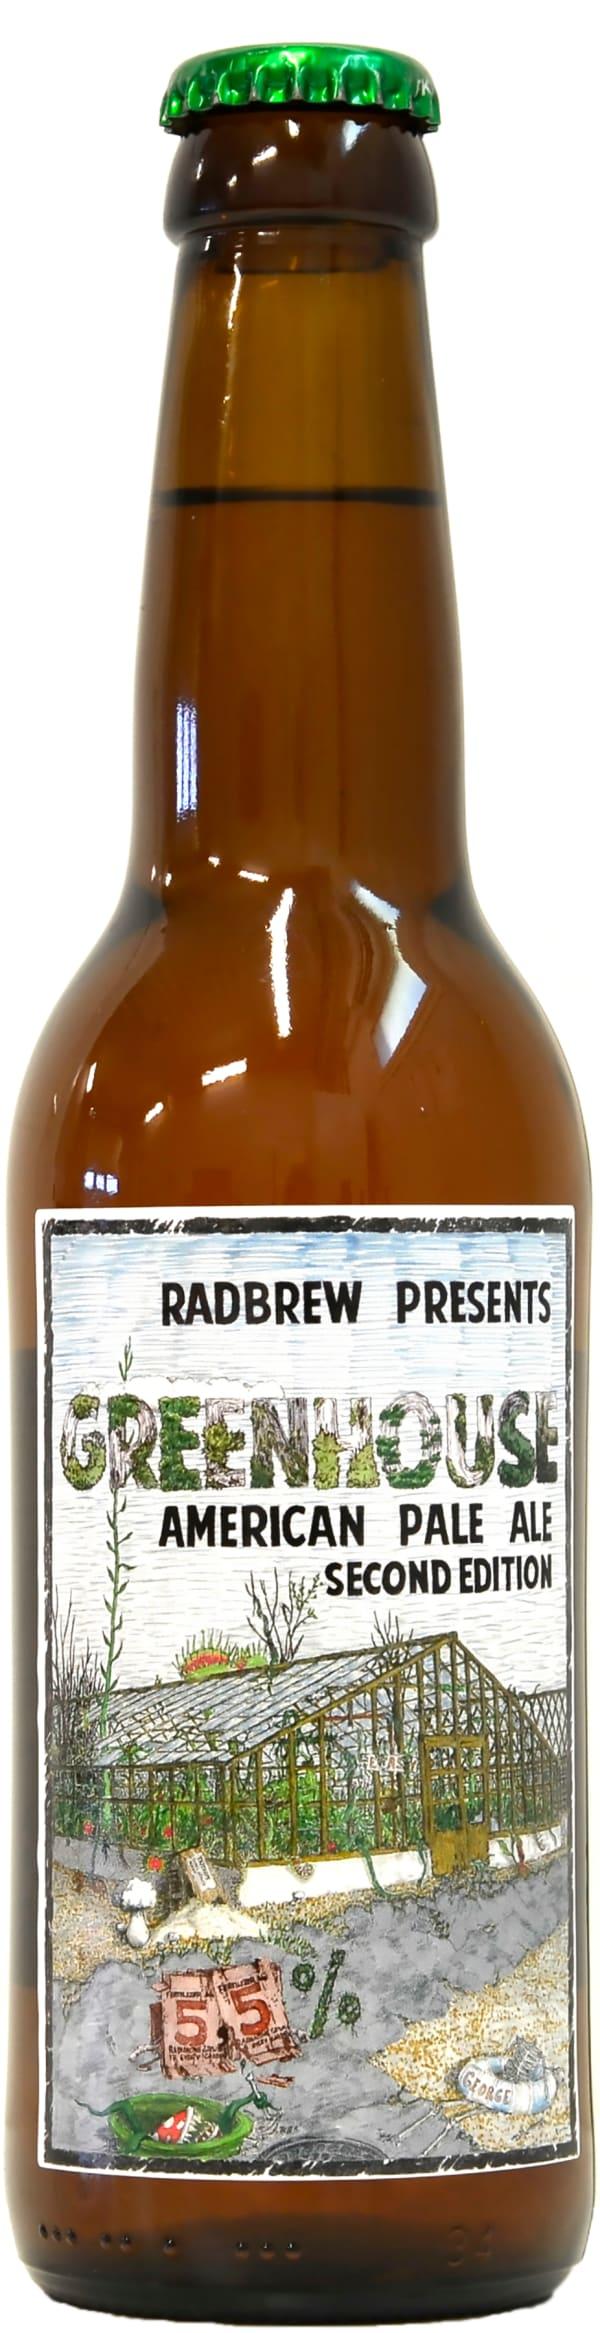 Radbrew Greenhouse Second Edition